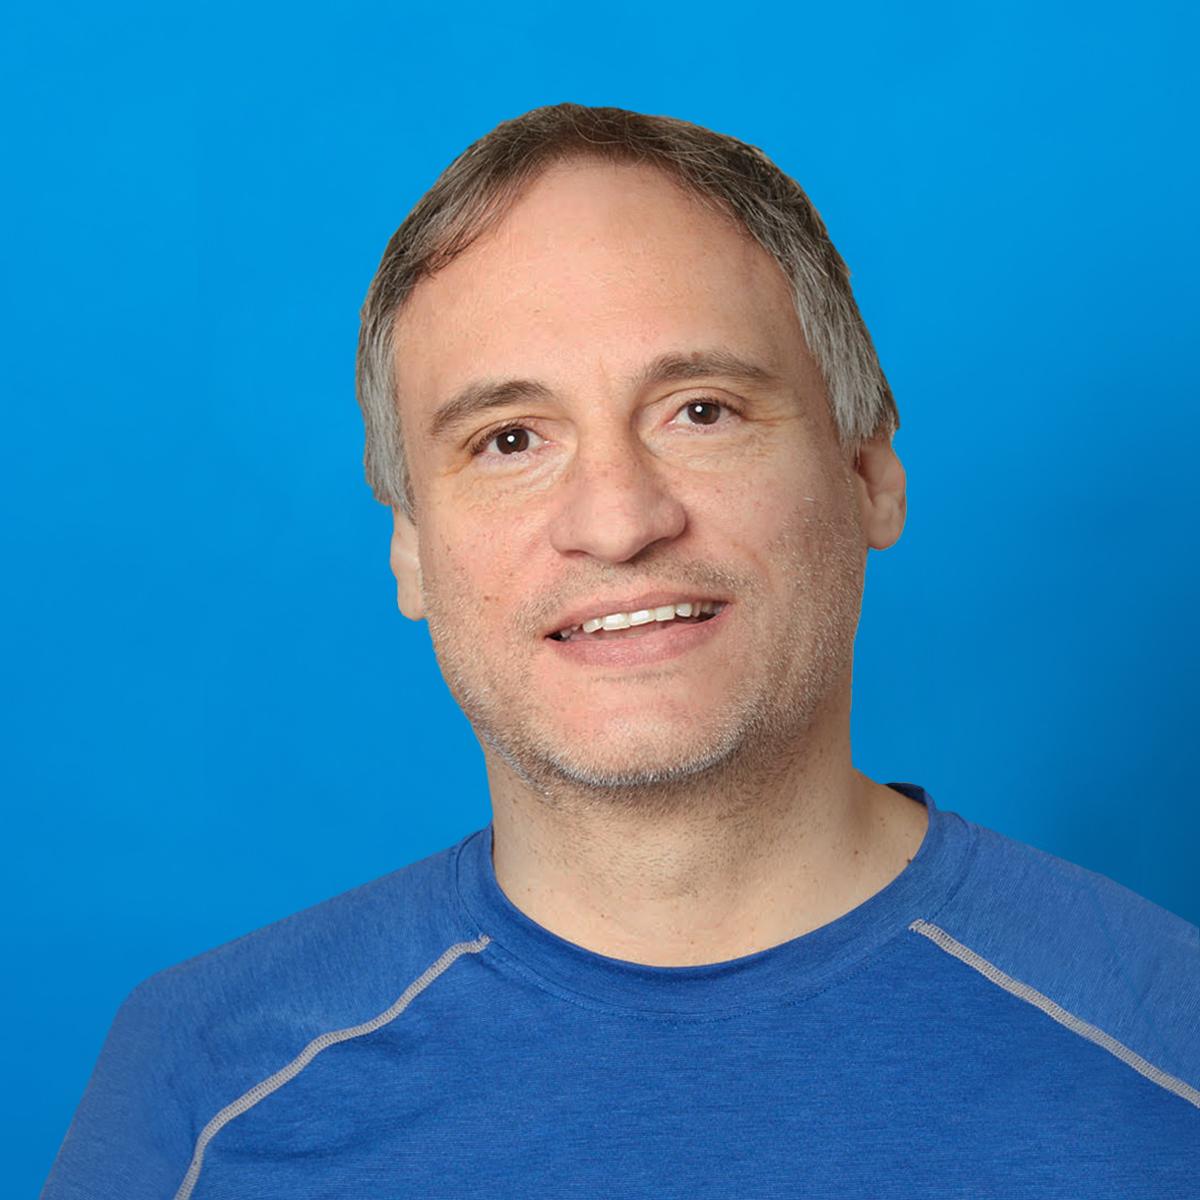 Stephen Avalone